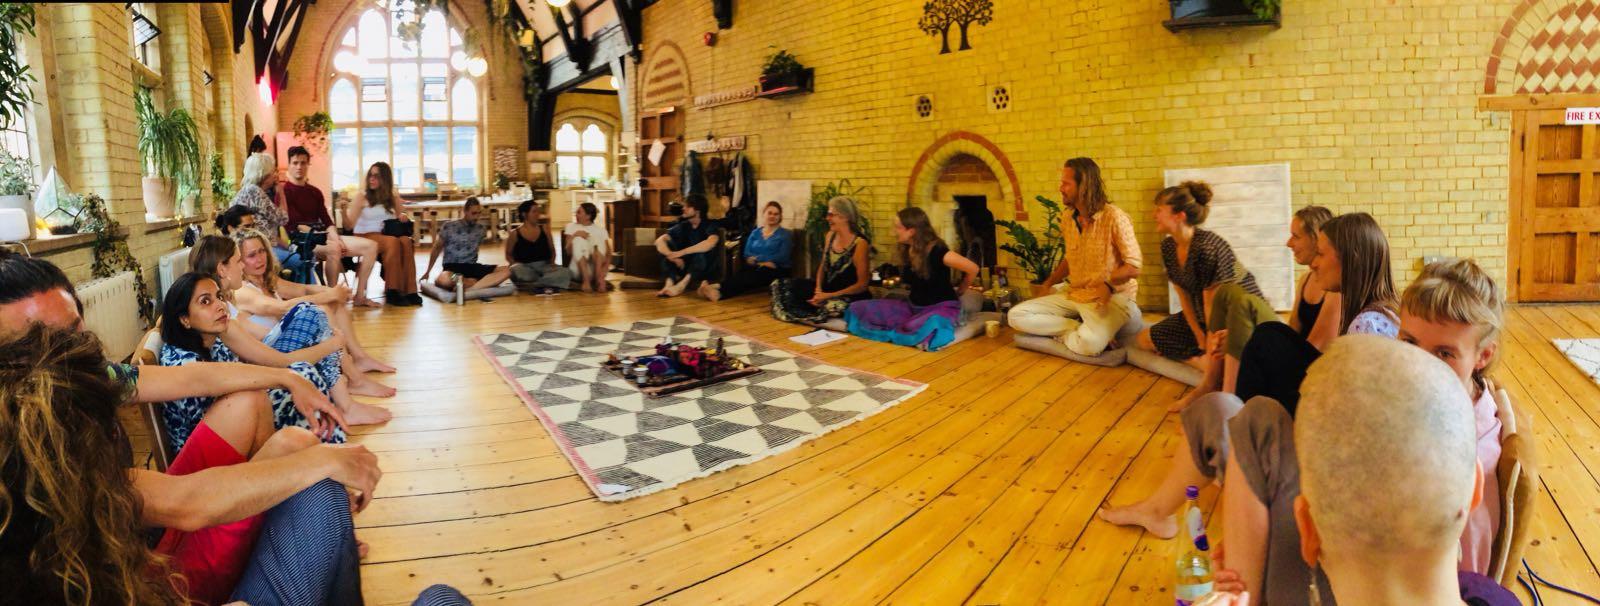 Ellen Kittredge & Debra Deglyn / Re-harmonizing with Nature: Healing Self, Community, World